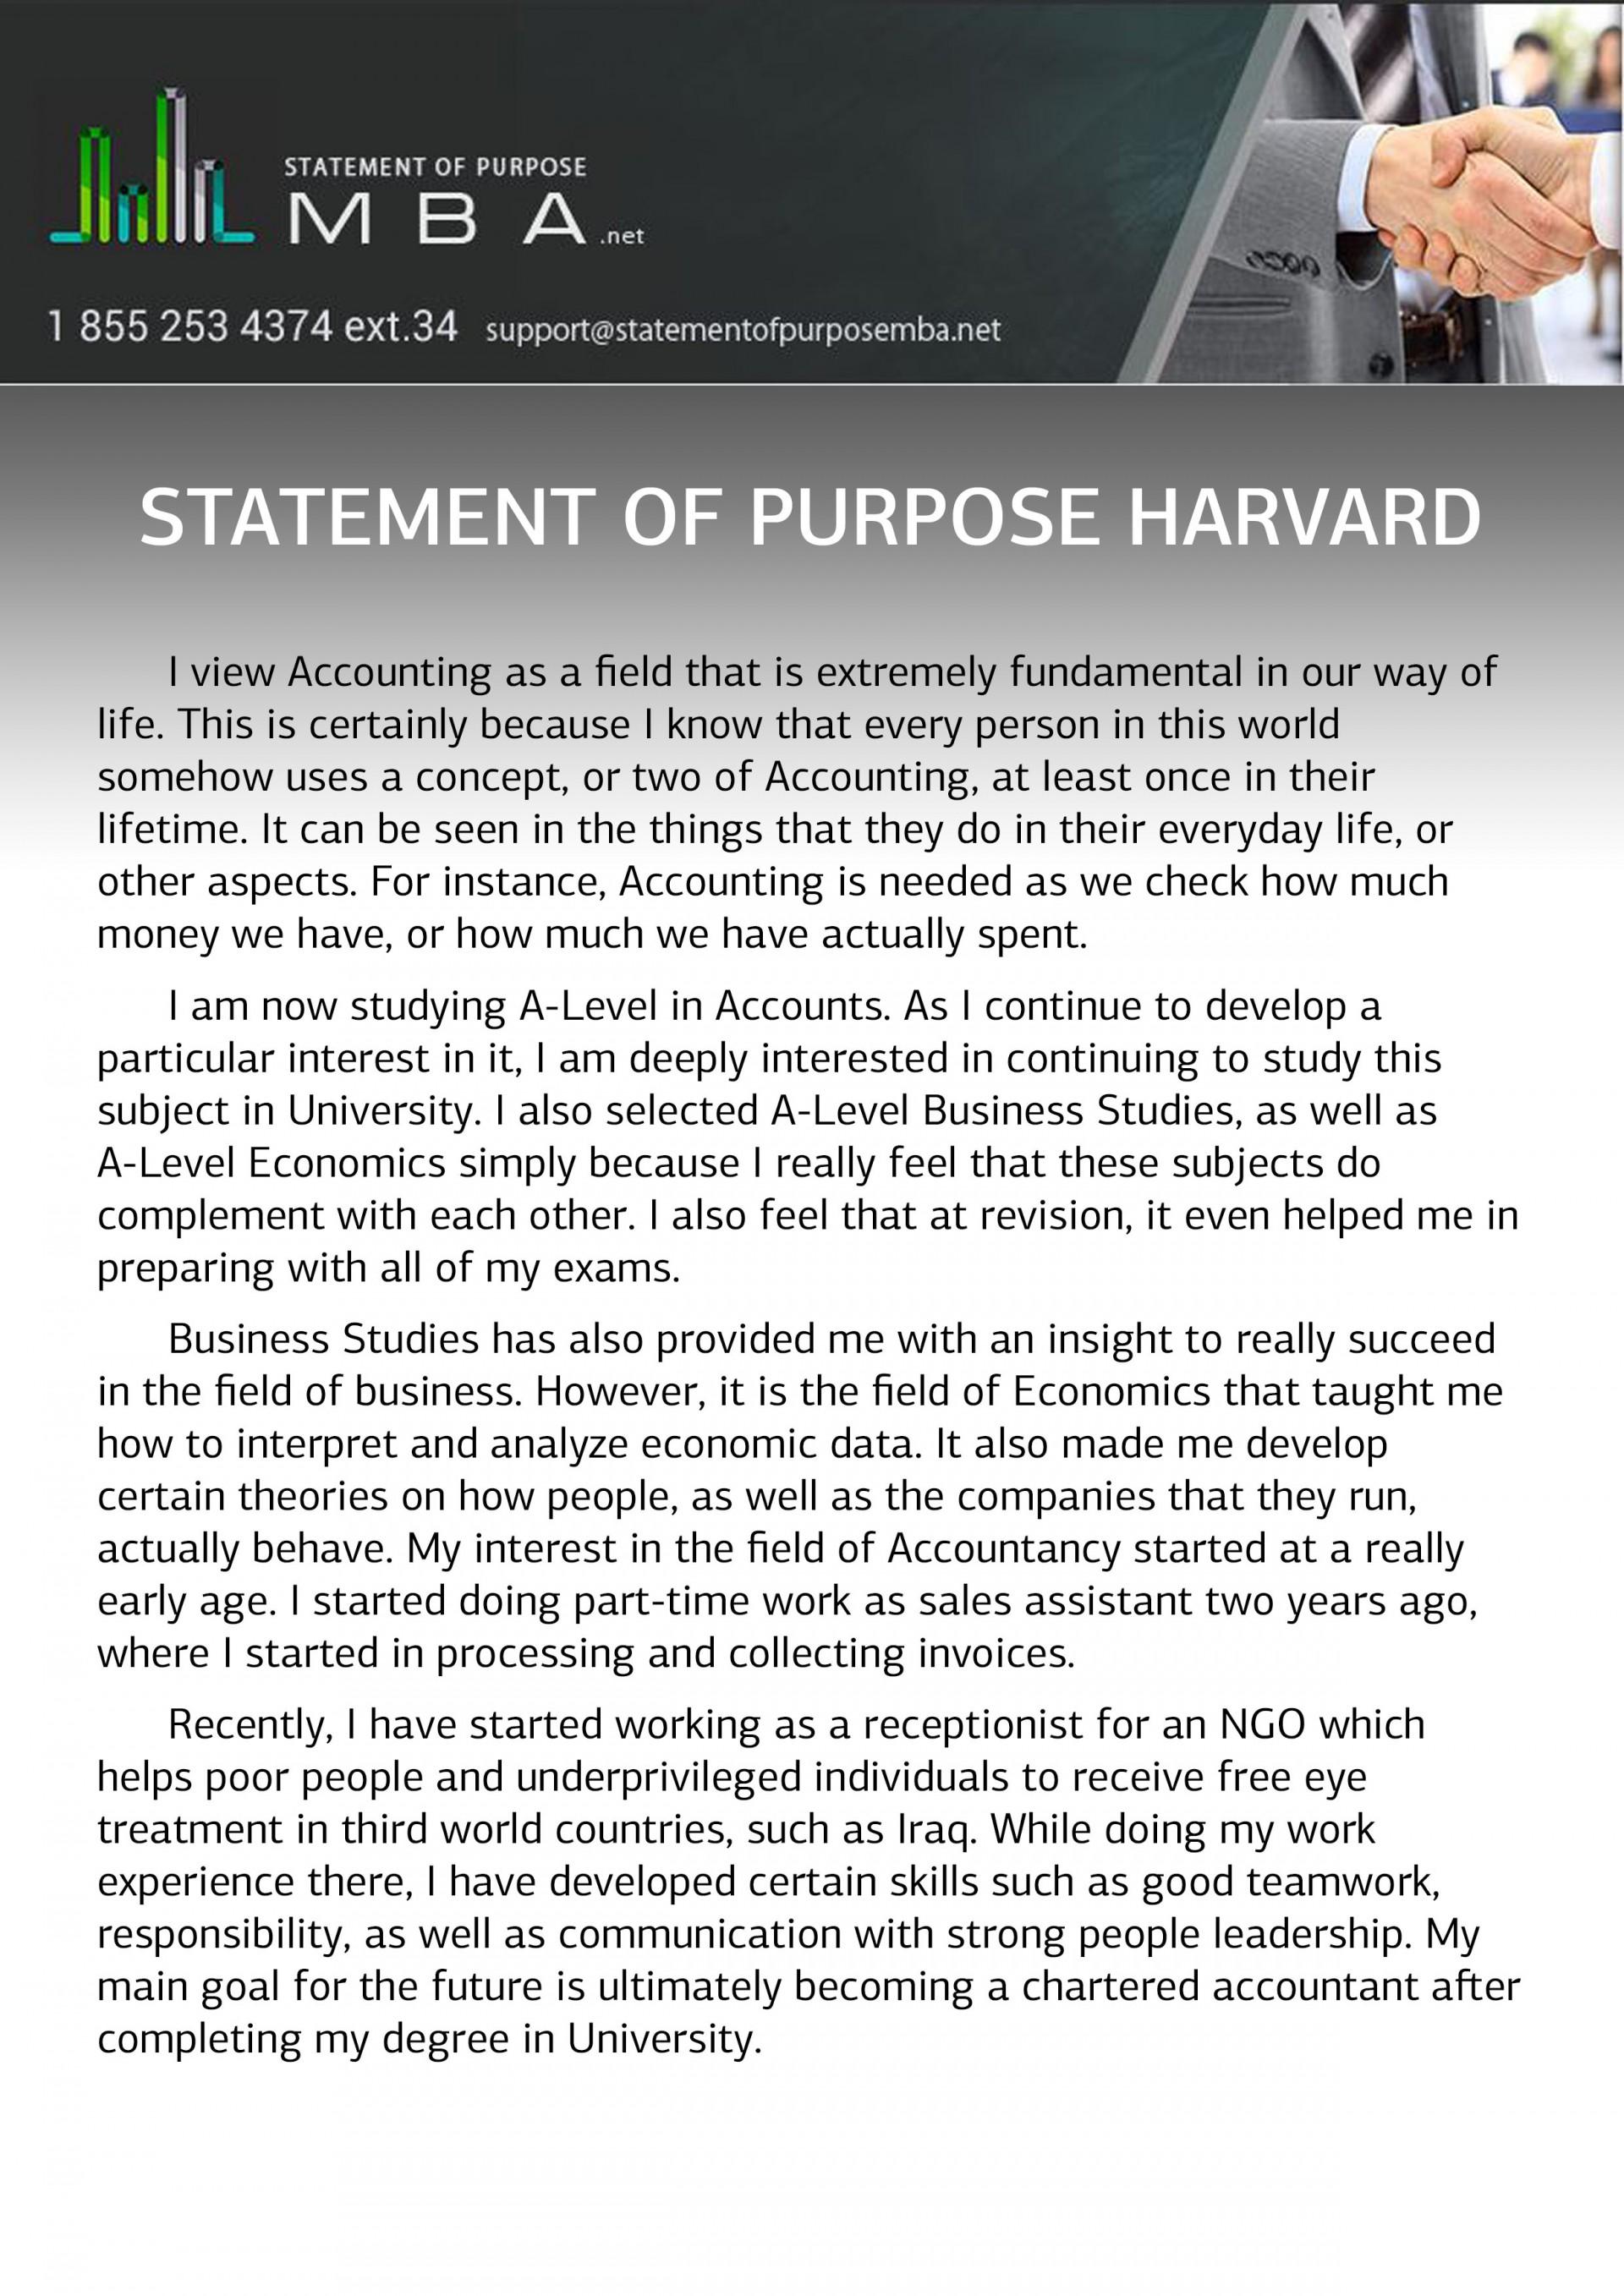 004 Statement Of Purpose Harvard Sample Essay Prompt Astounding Prompts 2017-18 College 2017 1920